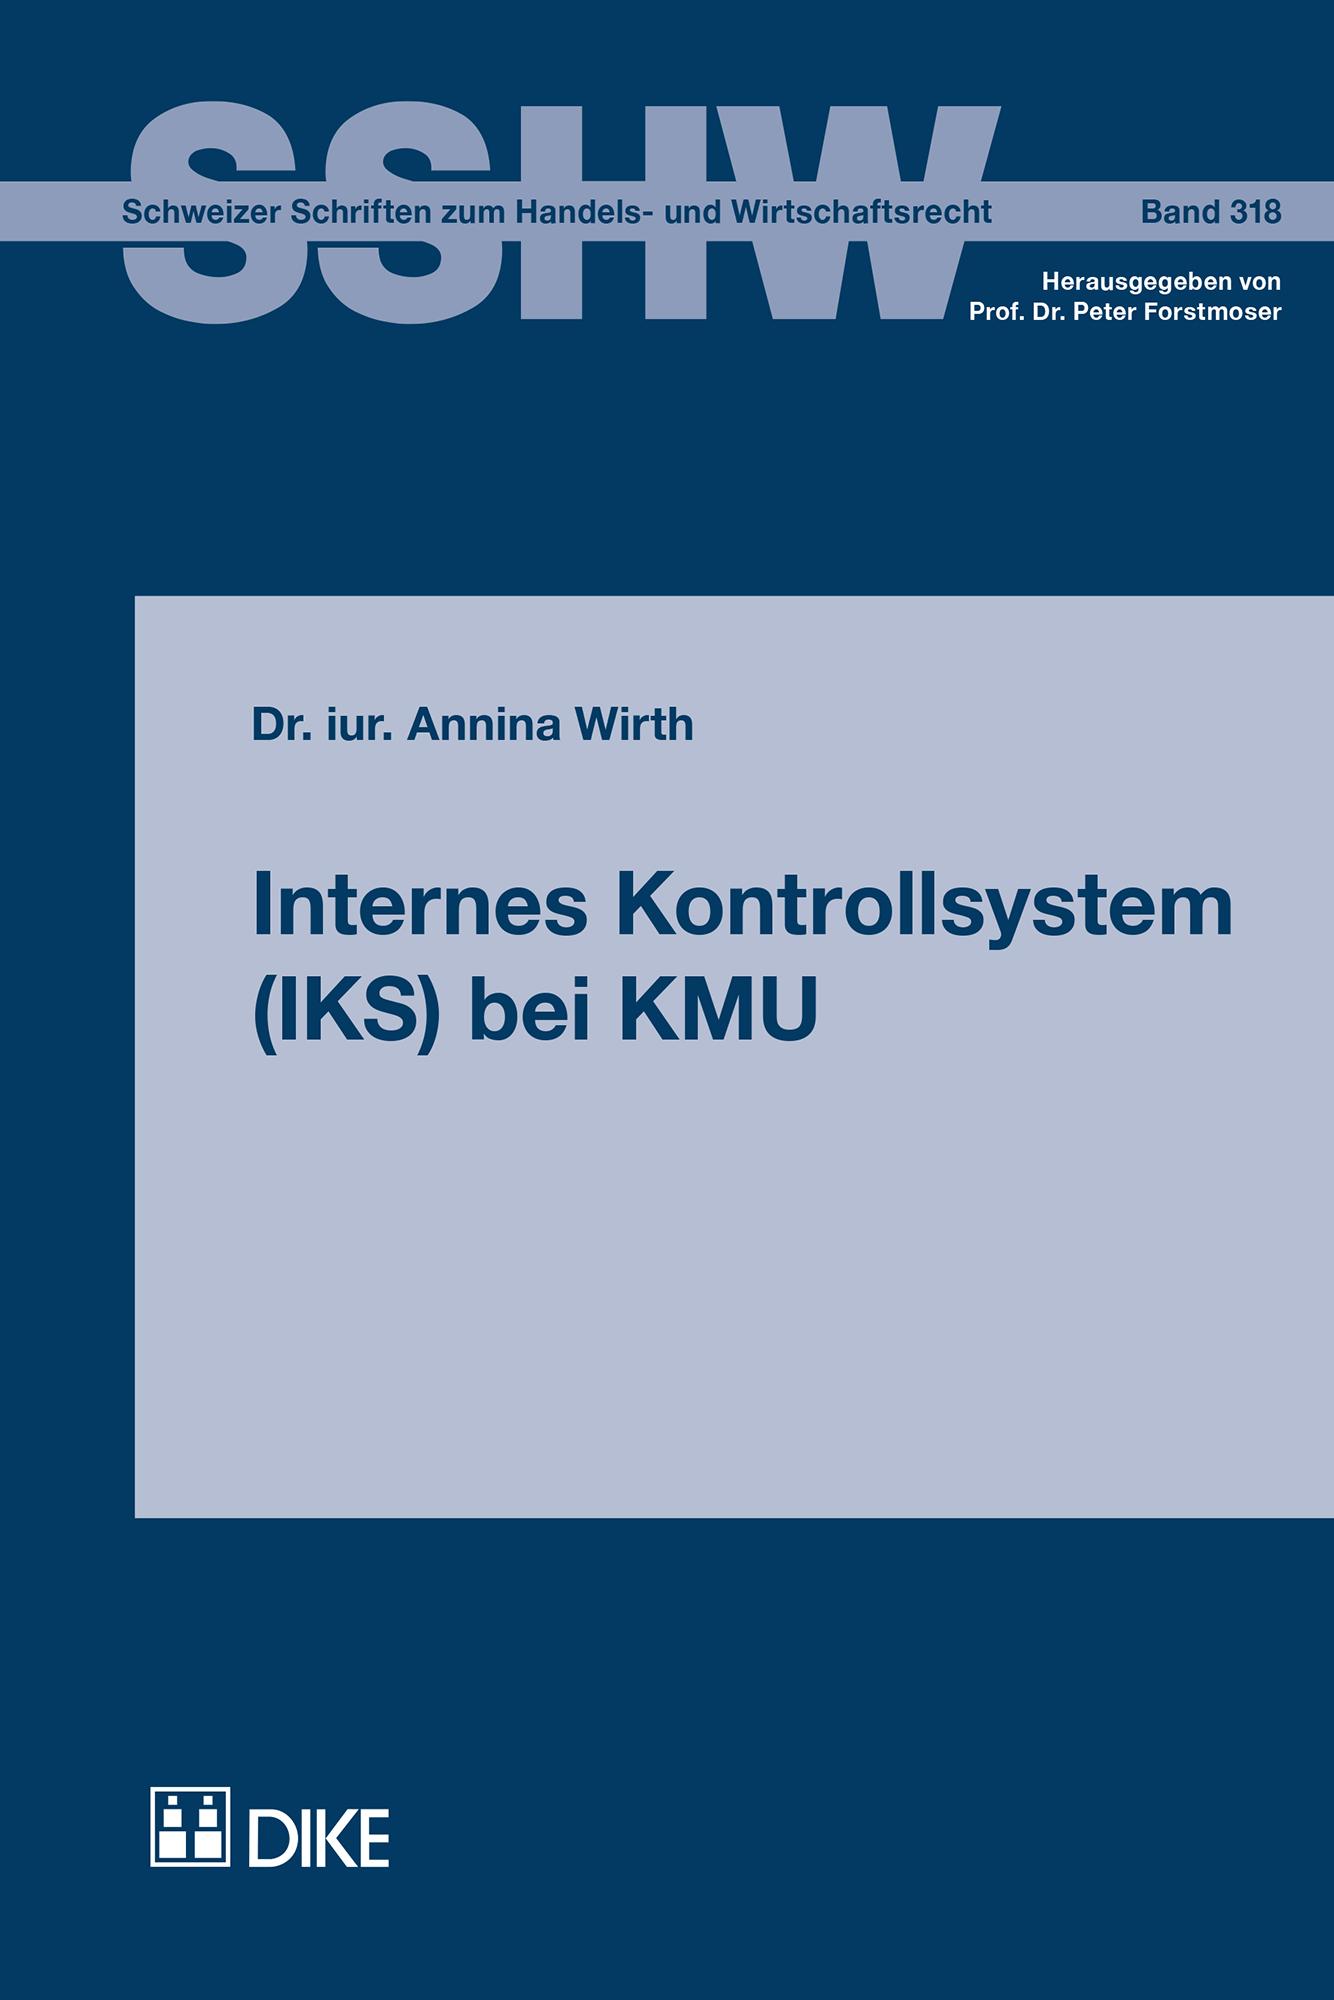 Internes Kontrollsystem (IKS) bei KMU